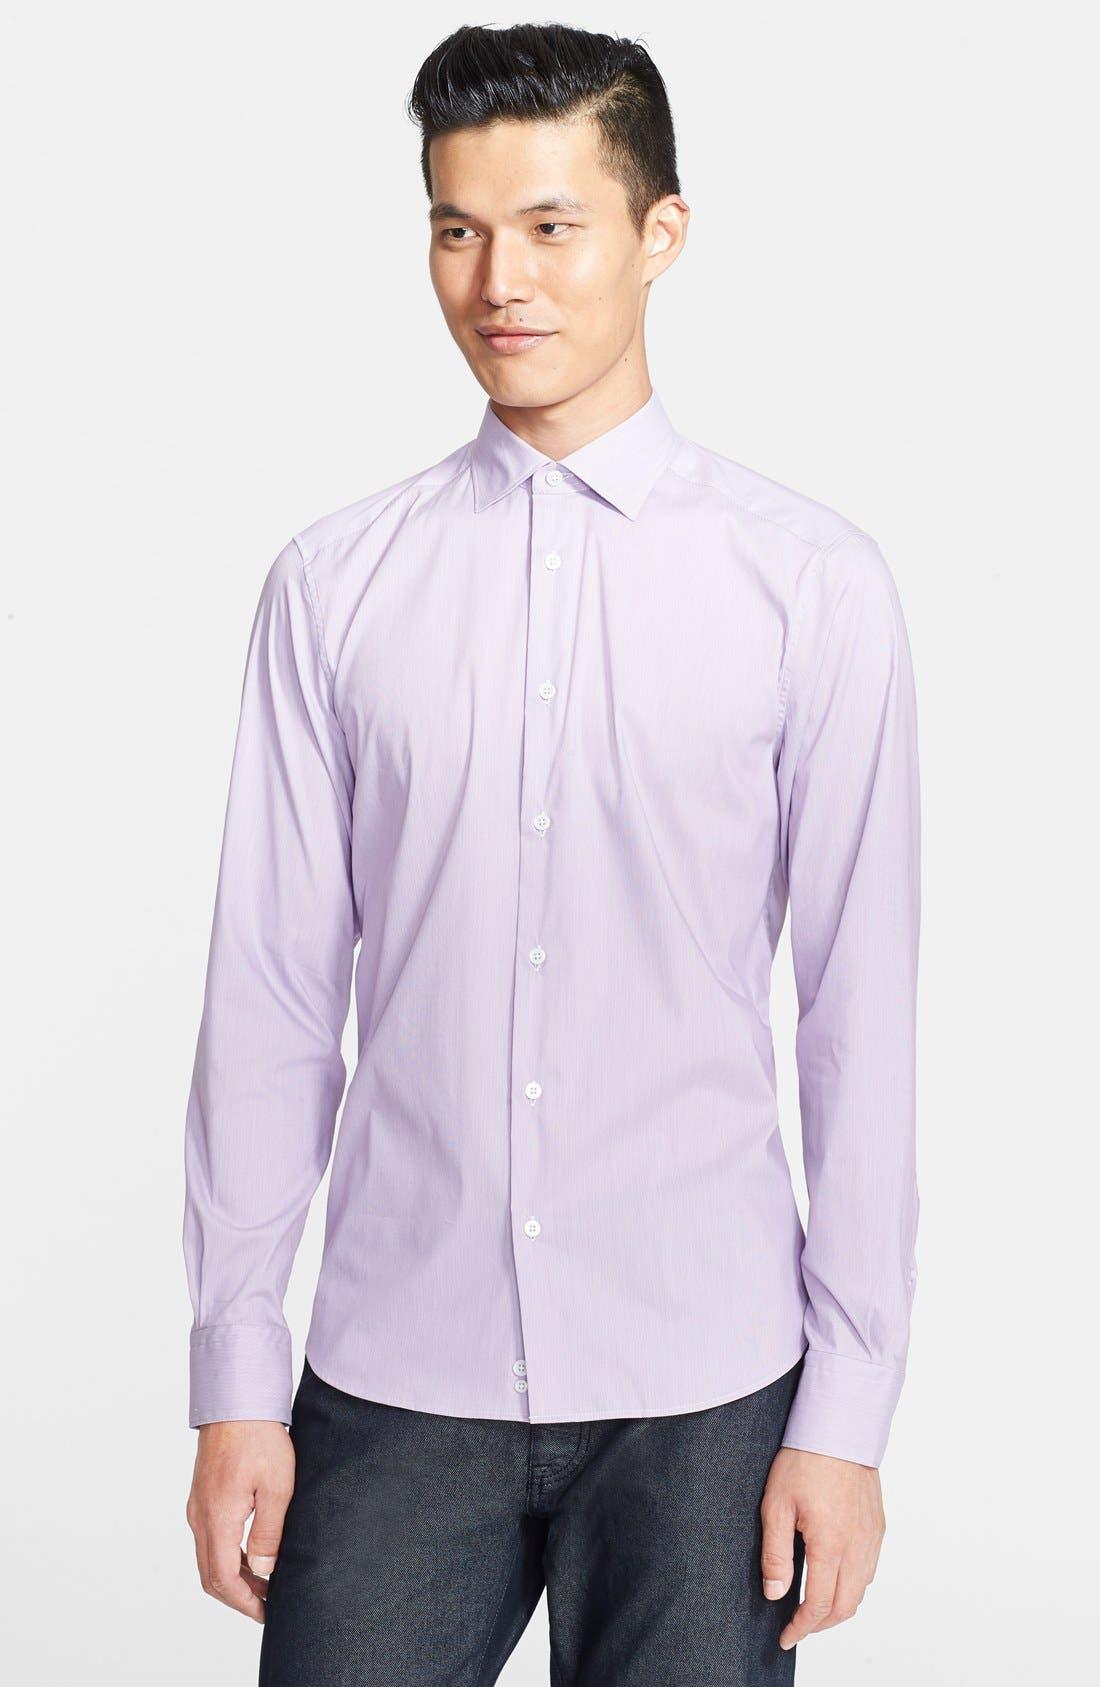 Main Image - Z Zegna Extra Trim Fit Stripe Dress Shirt